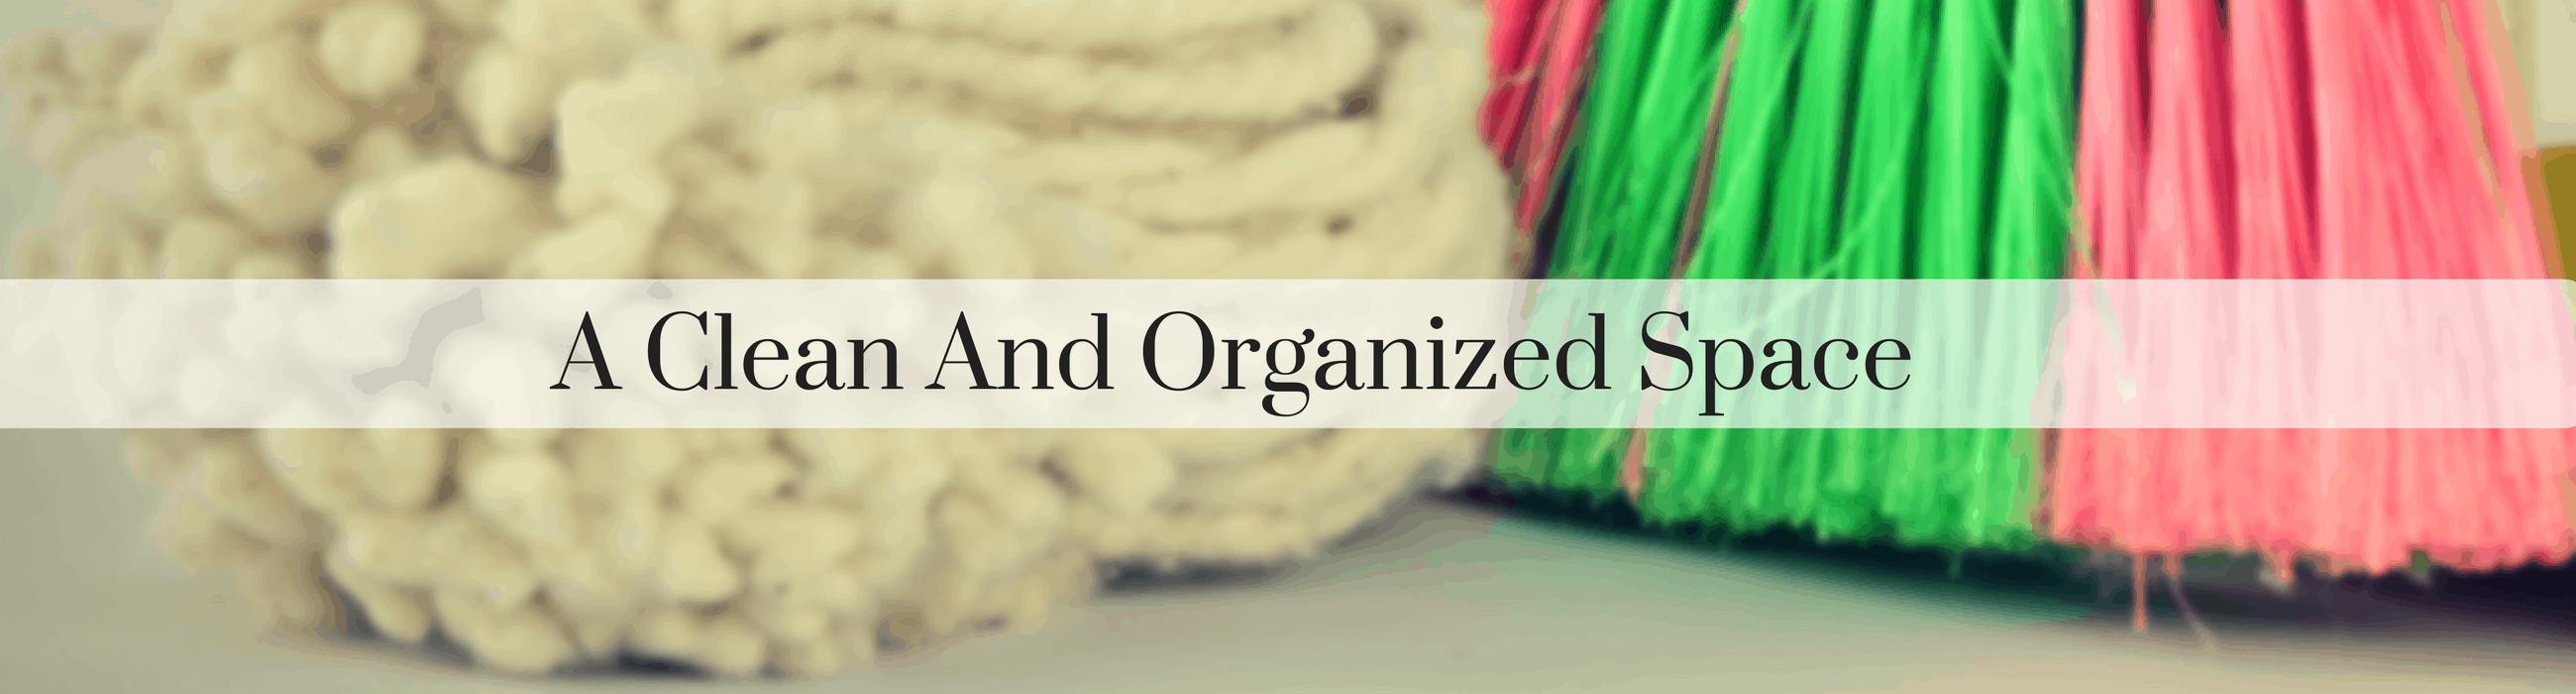 Clean Organized Space